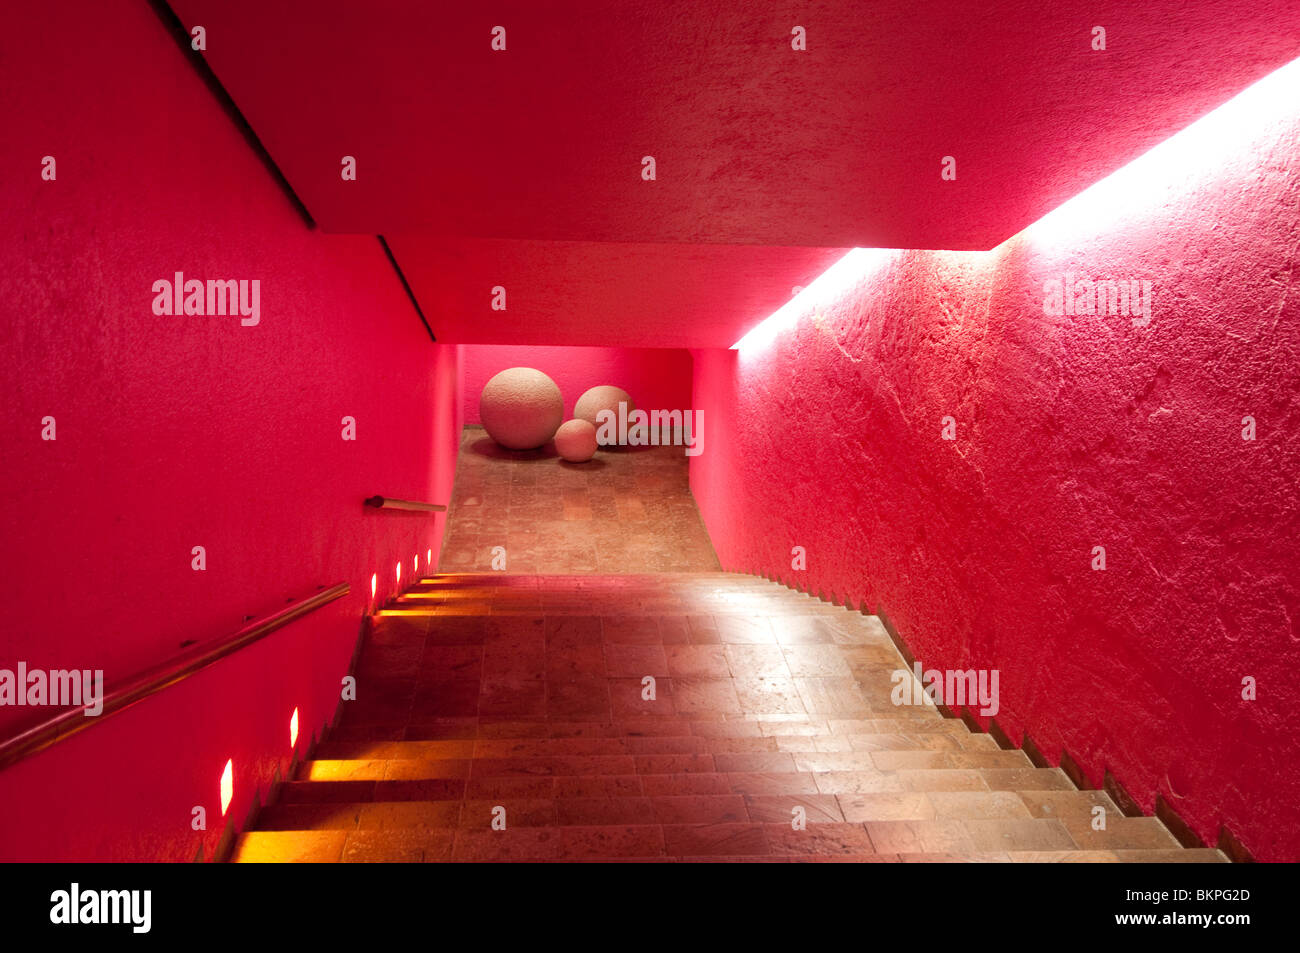 Treppe zum Eingang des Restaurants Las Brisas Hotel Ixtapa/Zihuatanejo Guerrero Mexiko Stockbild